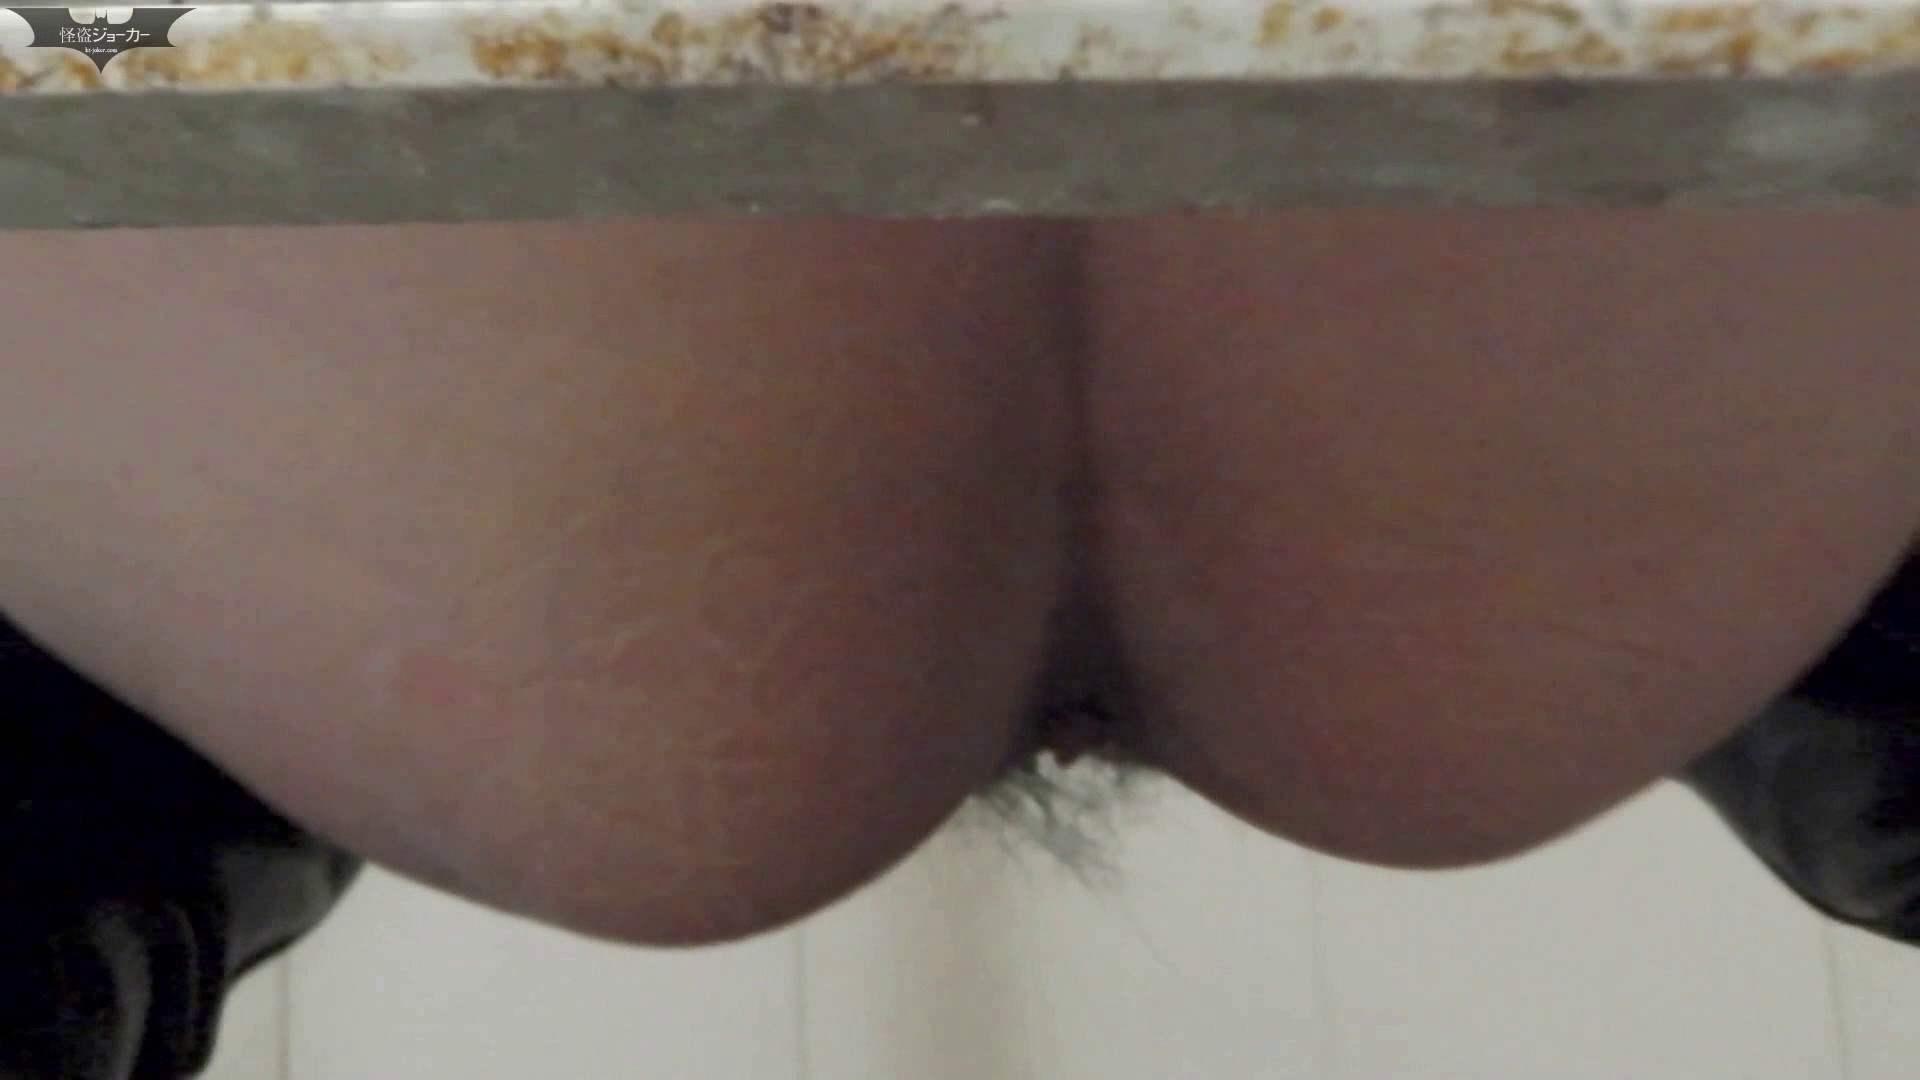 Vol.06 ピチピチが入室きめ細かくマッシュルームのような肌に癒される OL女体 オマンコ無修正動画無料 65連発 47